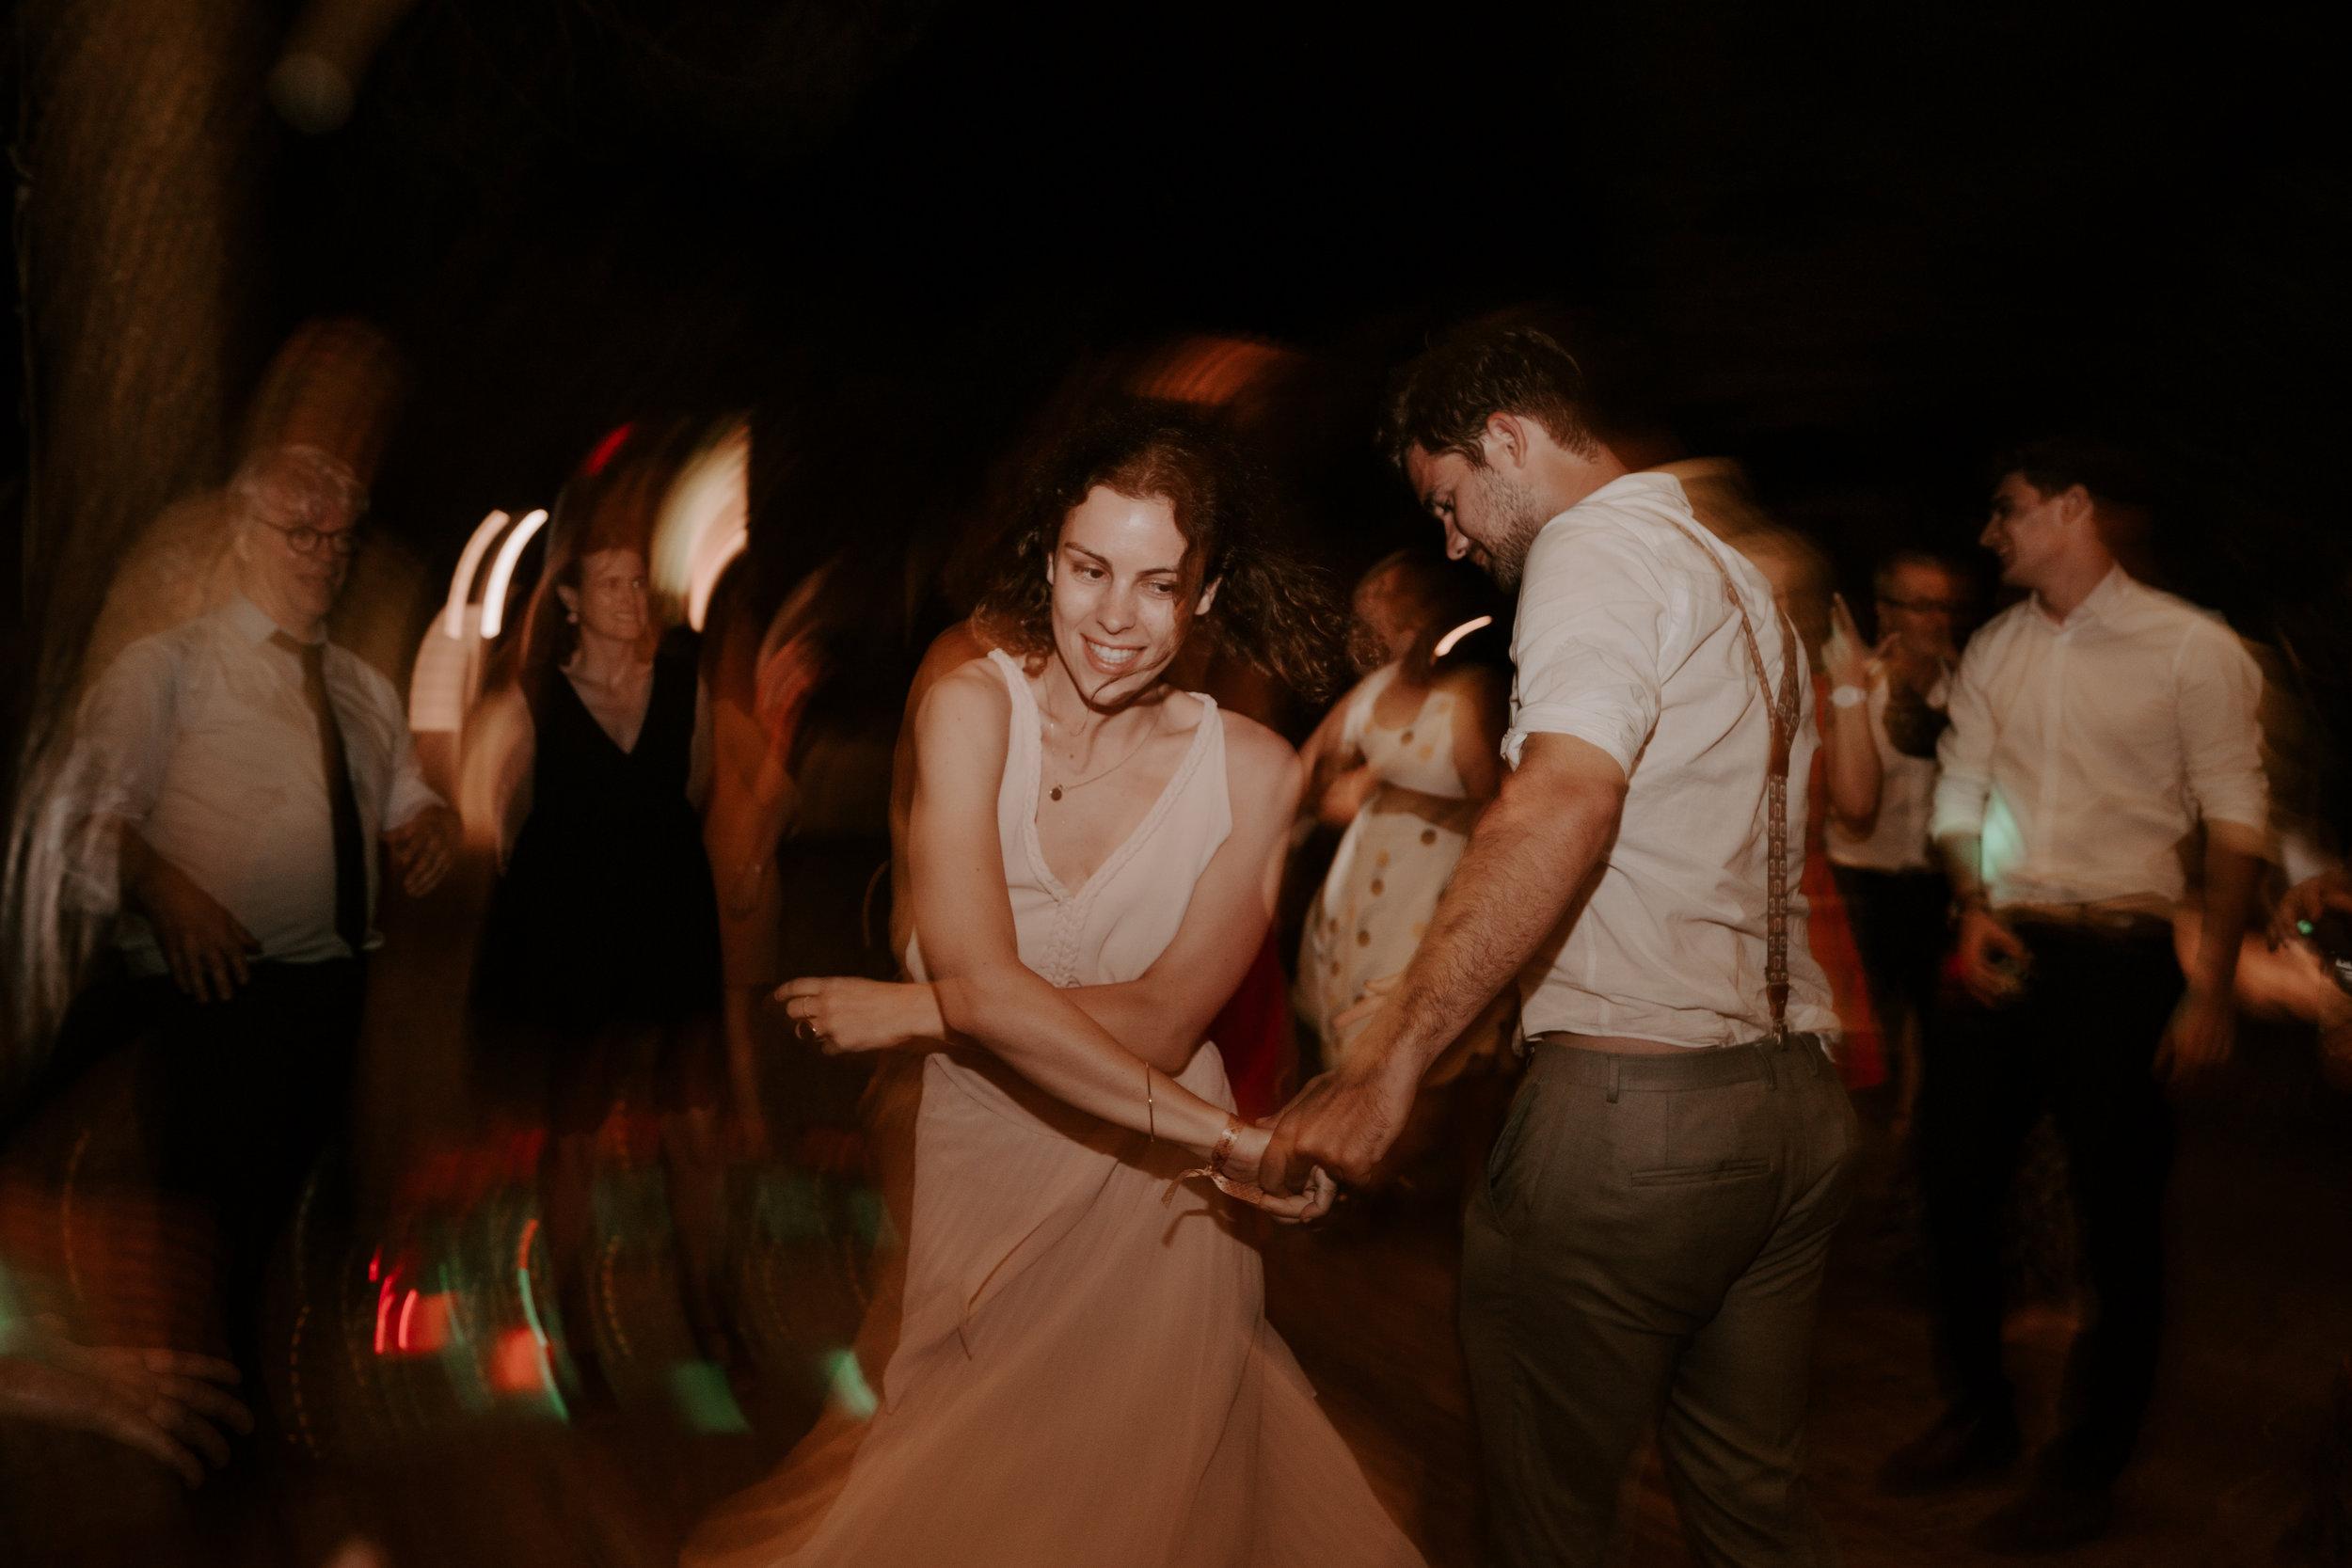 elsacaza_photographe_mariage_Juliette_Nicolas-1040.jpg